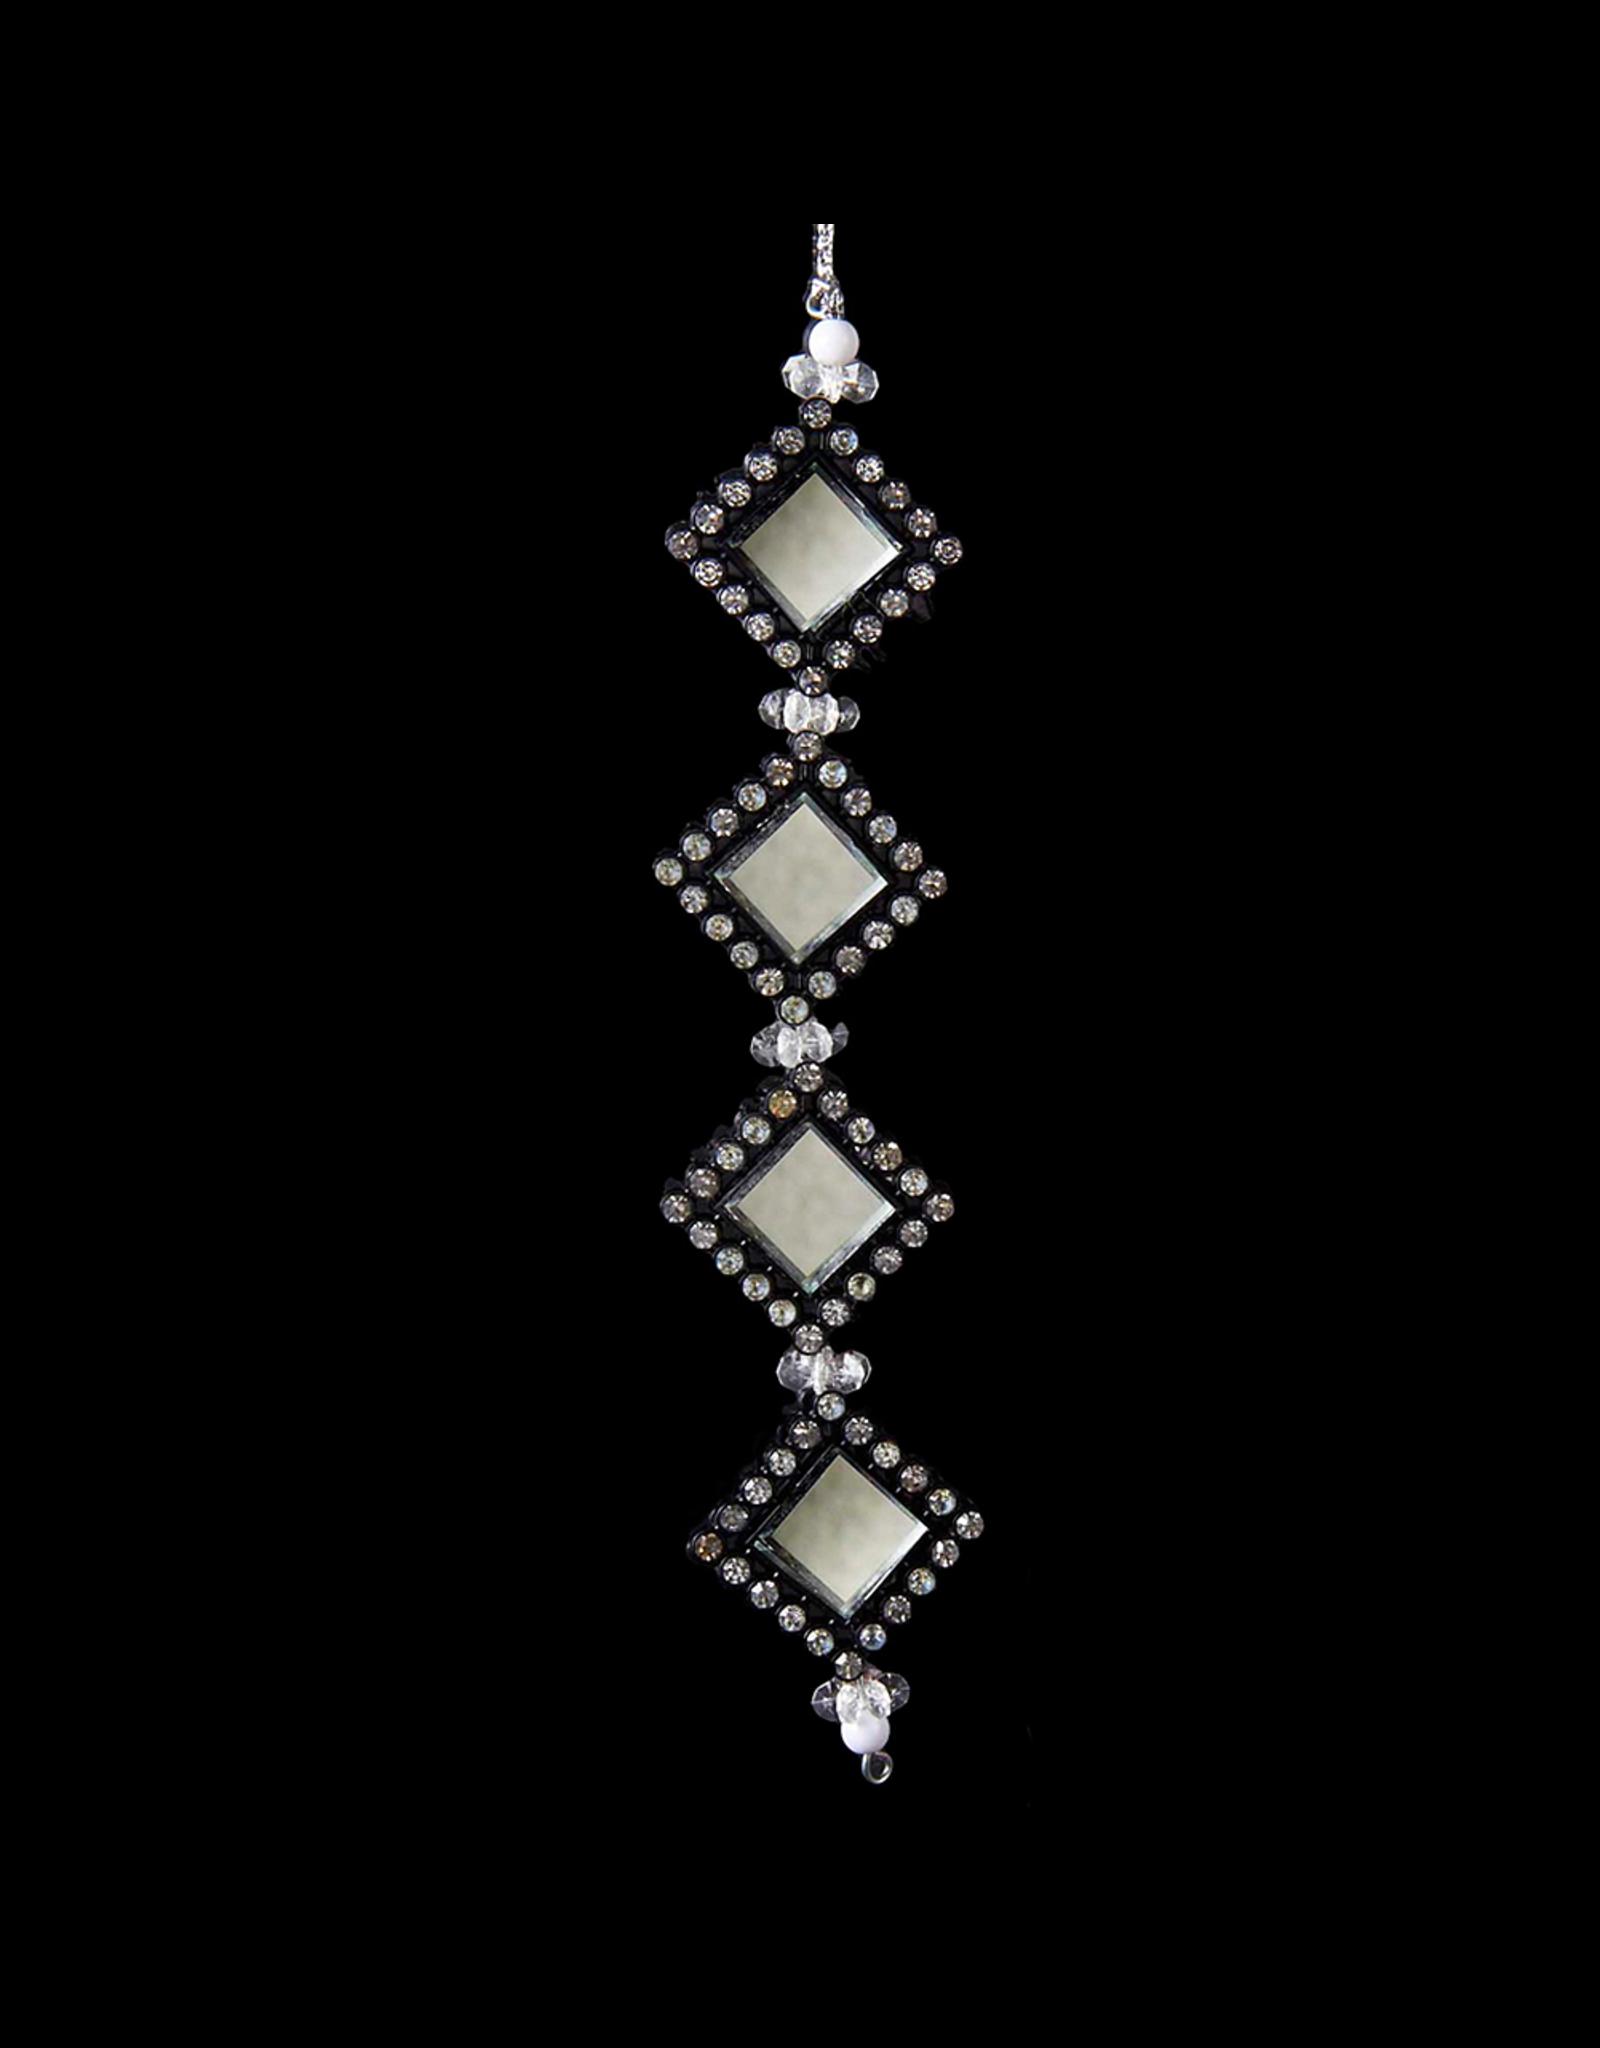 Kurt Adler Black and Silver Gemstone Ornament Square -A